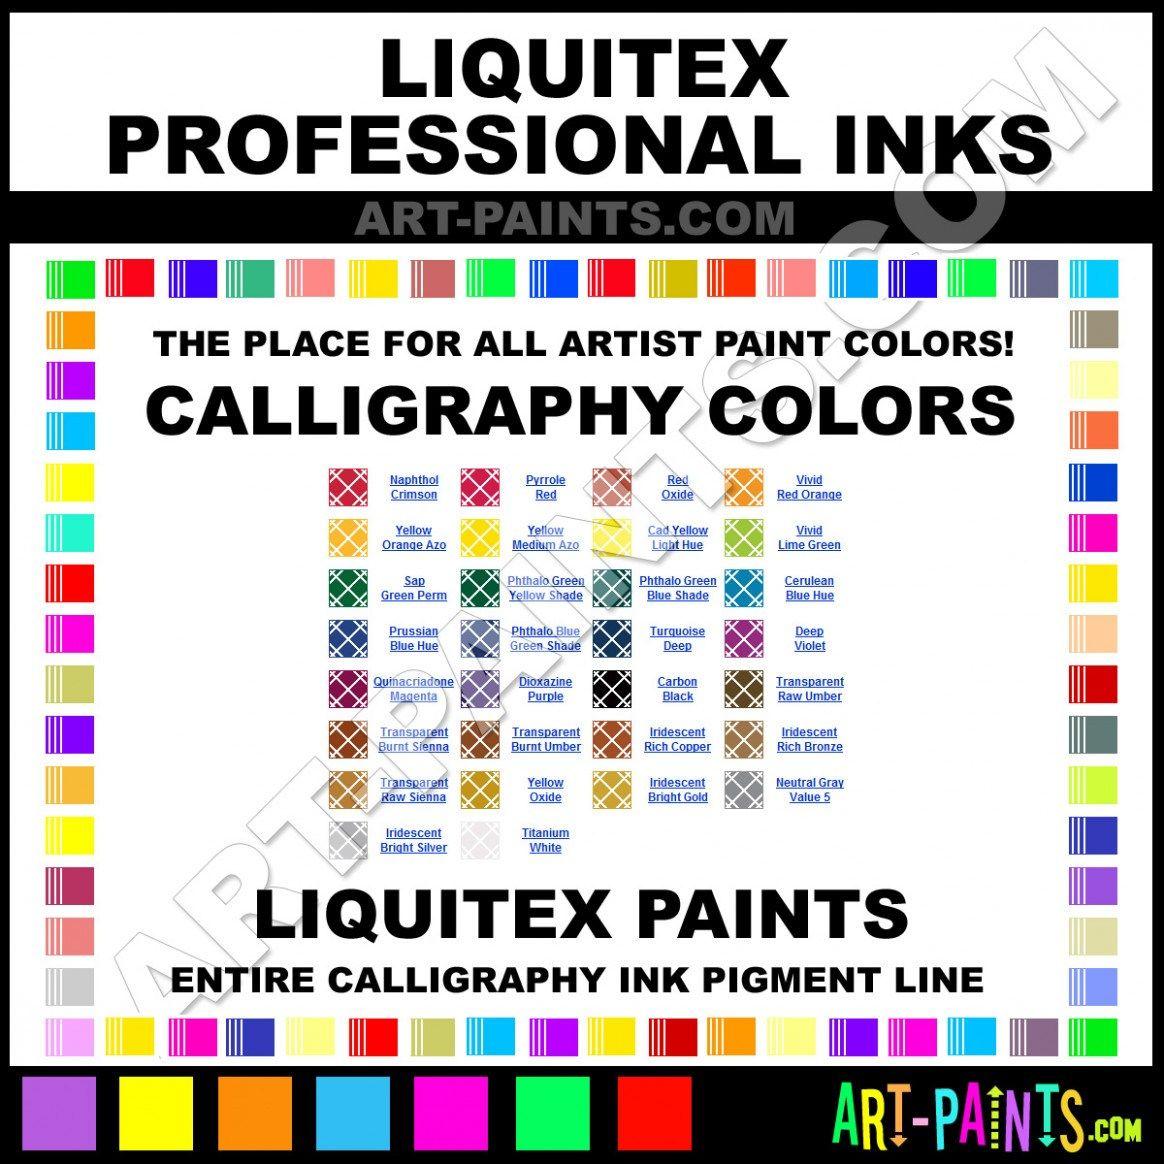 Liquitex Professional Ink Calligraphy Ink Paint Colors Calligraphy Liquitex Ink Color Paint Color Chart Spray Paint Colors Rustoleum Spray Paint Colors